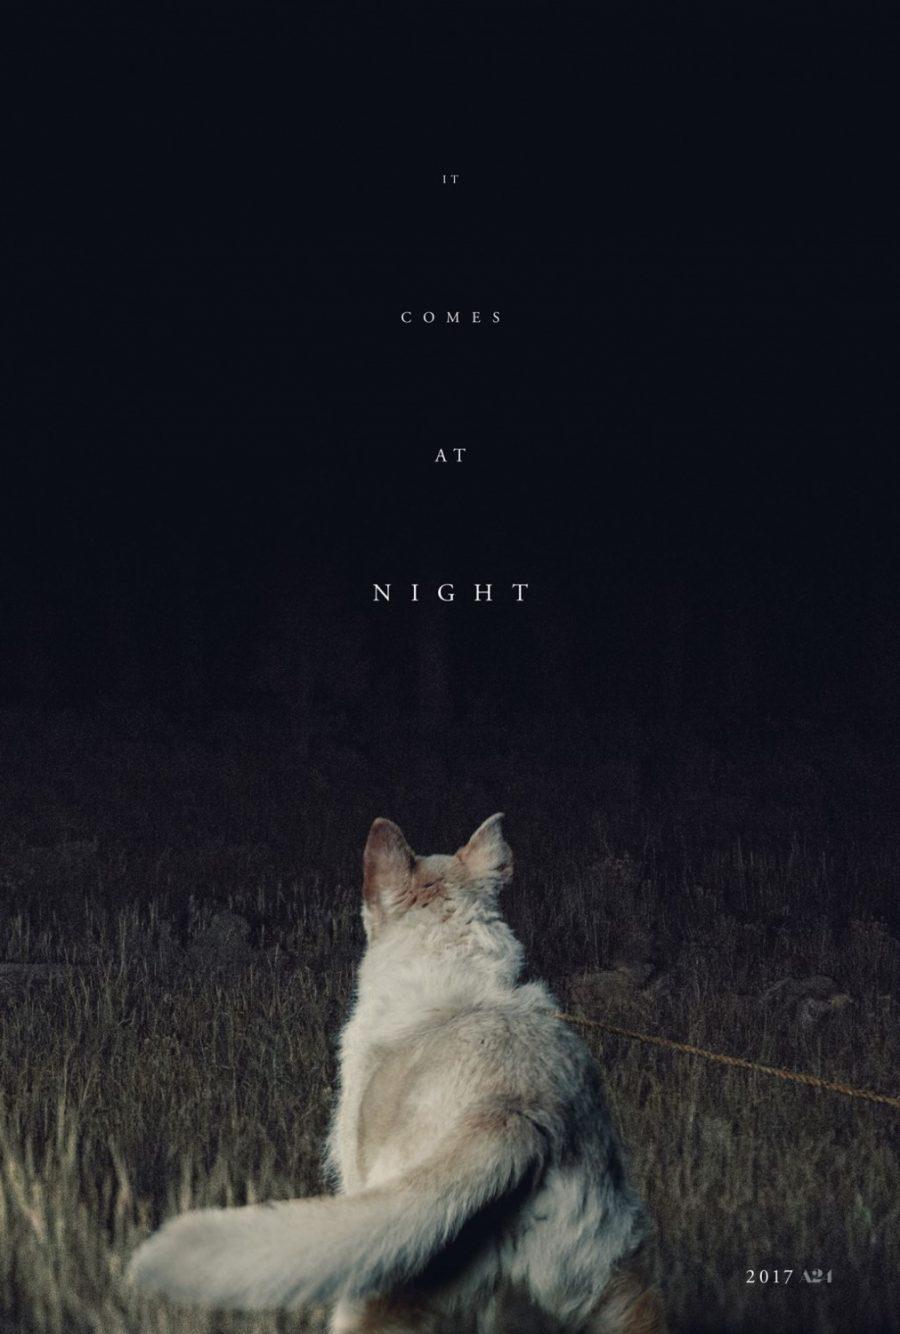 It-Comes-At-Night-900x0-c-default.jpg